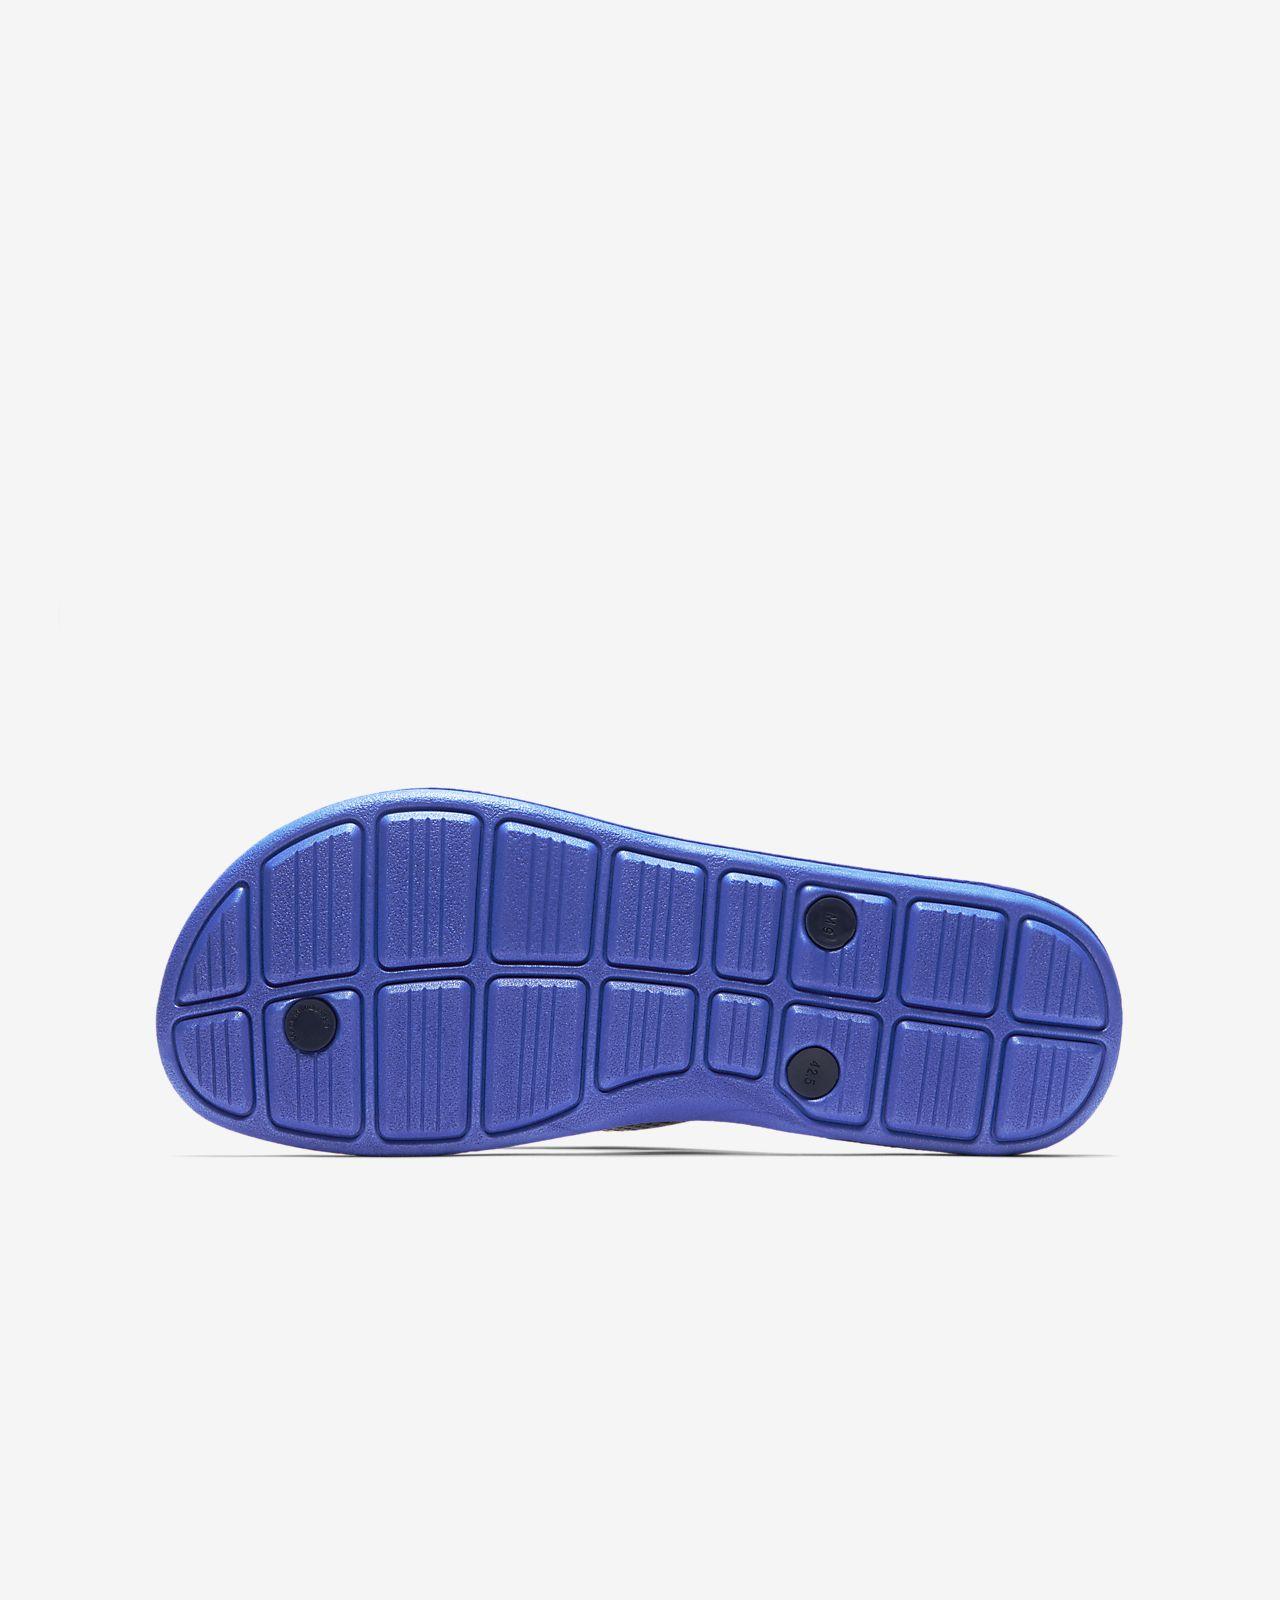 1c19508e1 Nike Solarsoft II Men s Flip Flop. Nike.com GB